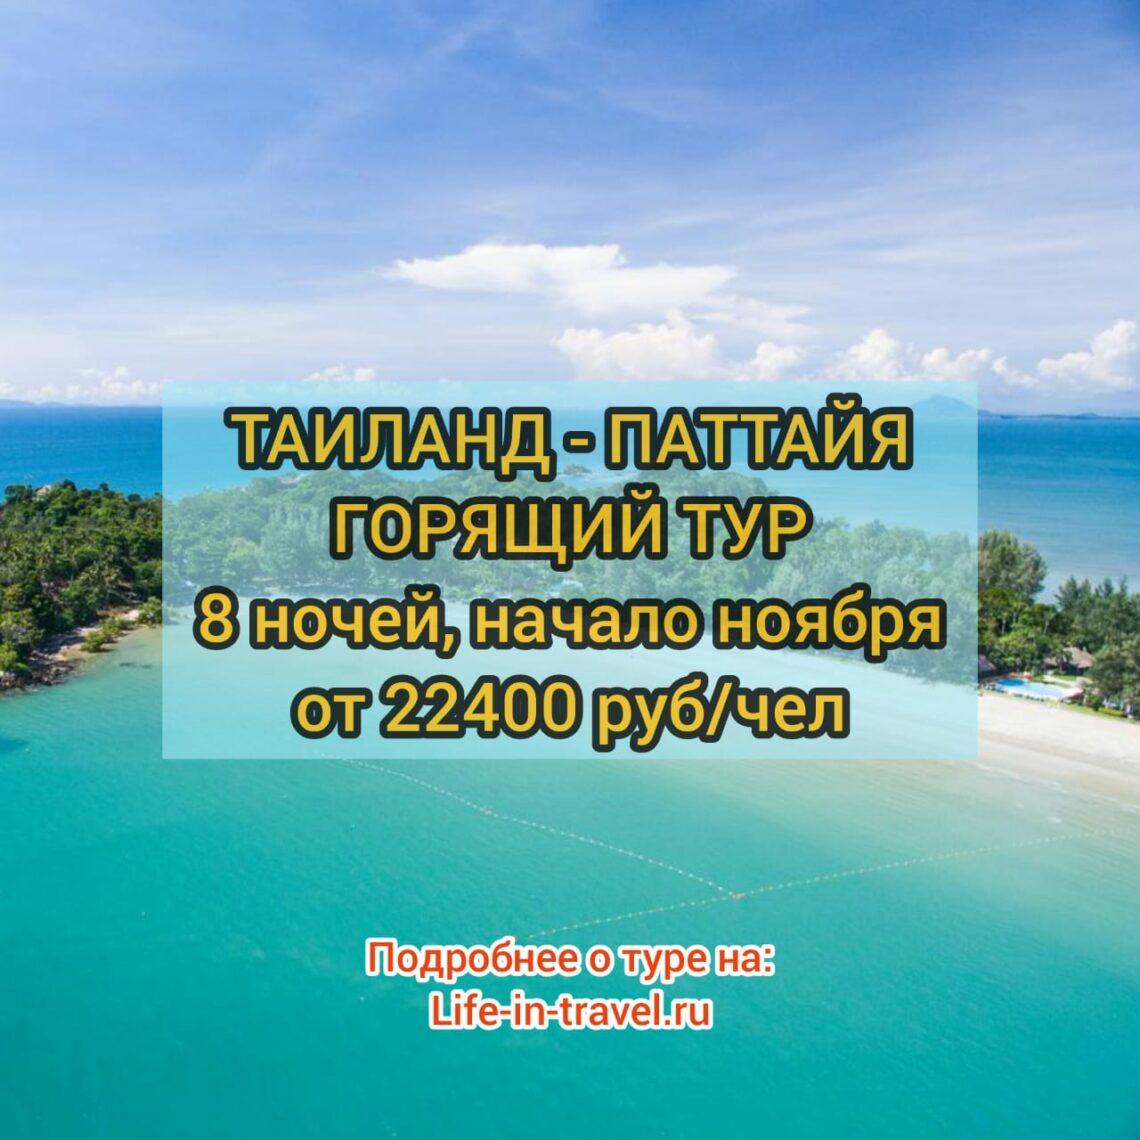 tur v tailand o phuket 25 049 rub chel - Тур в Таиланд о. Пхукет 25 049 руб. чел.